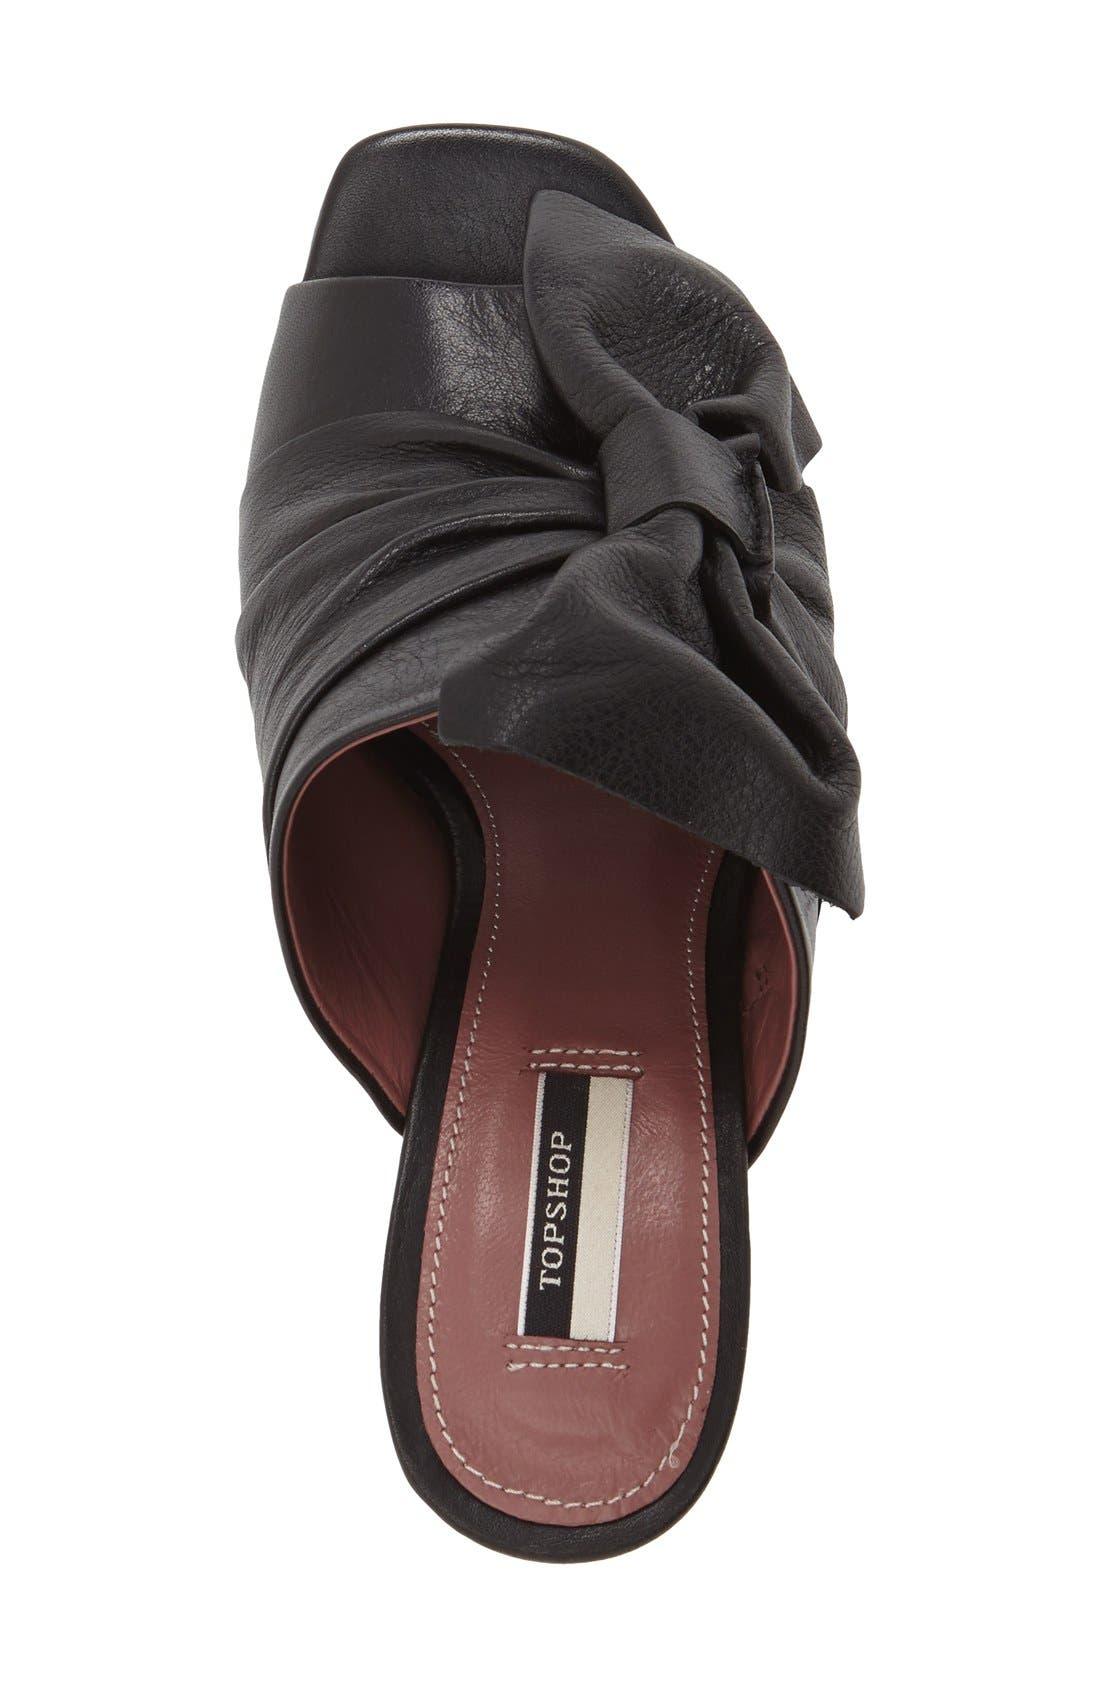 Alternate Image 3  - Topshop 'Prosecco' Square Toe Mule (Women)